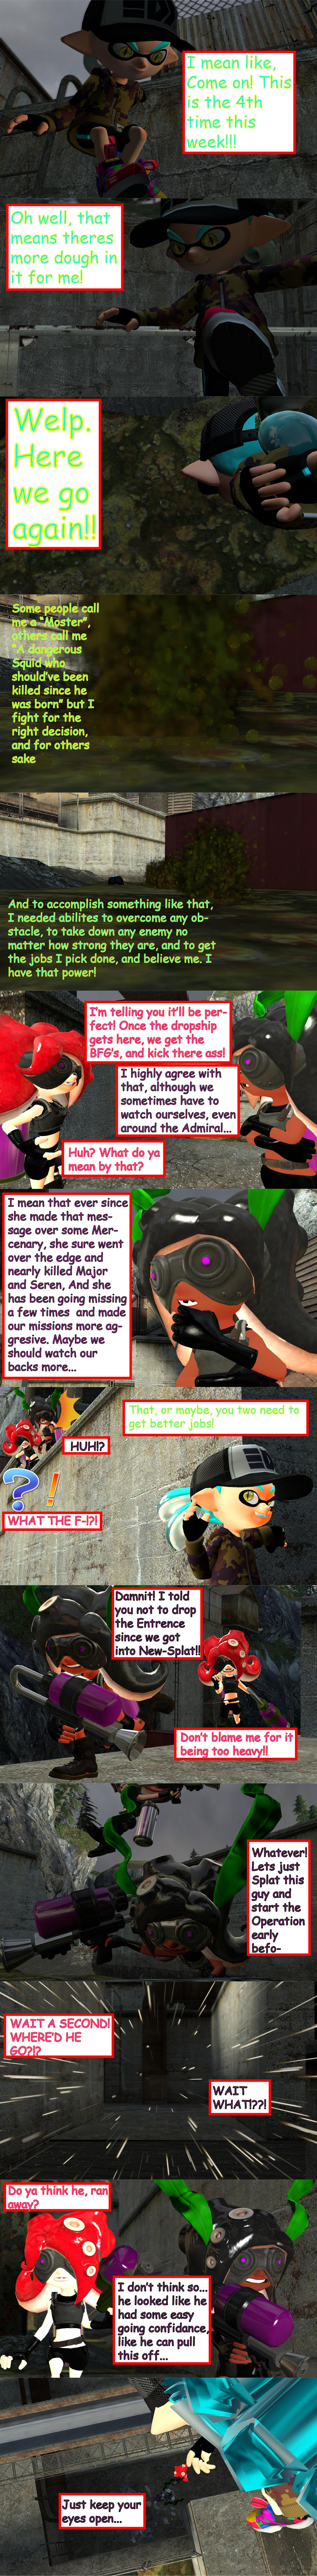 Splat-Mercs Reunion part 3 by GeneralGreaseMonkey